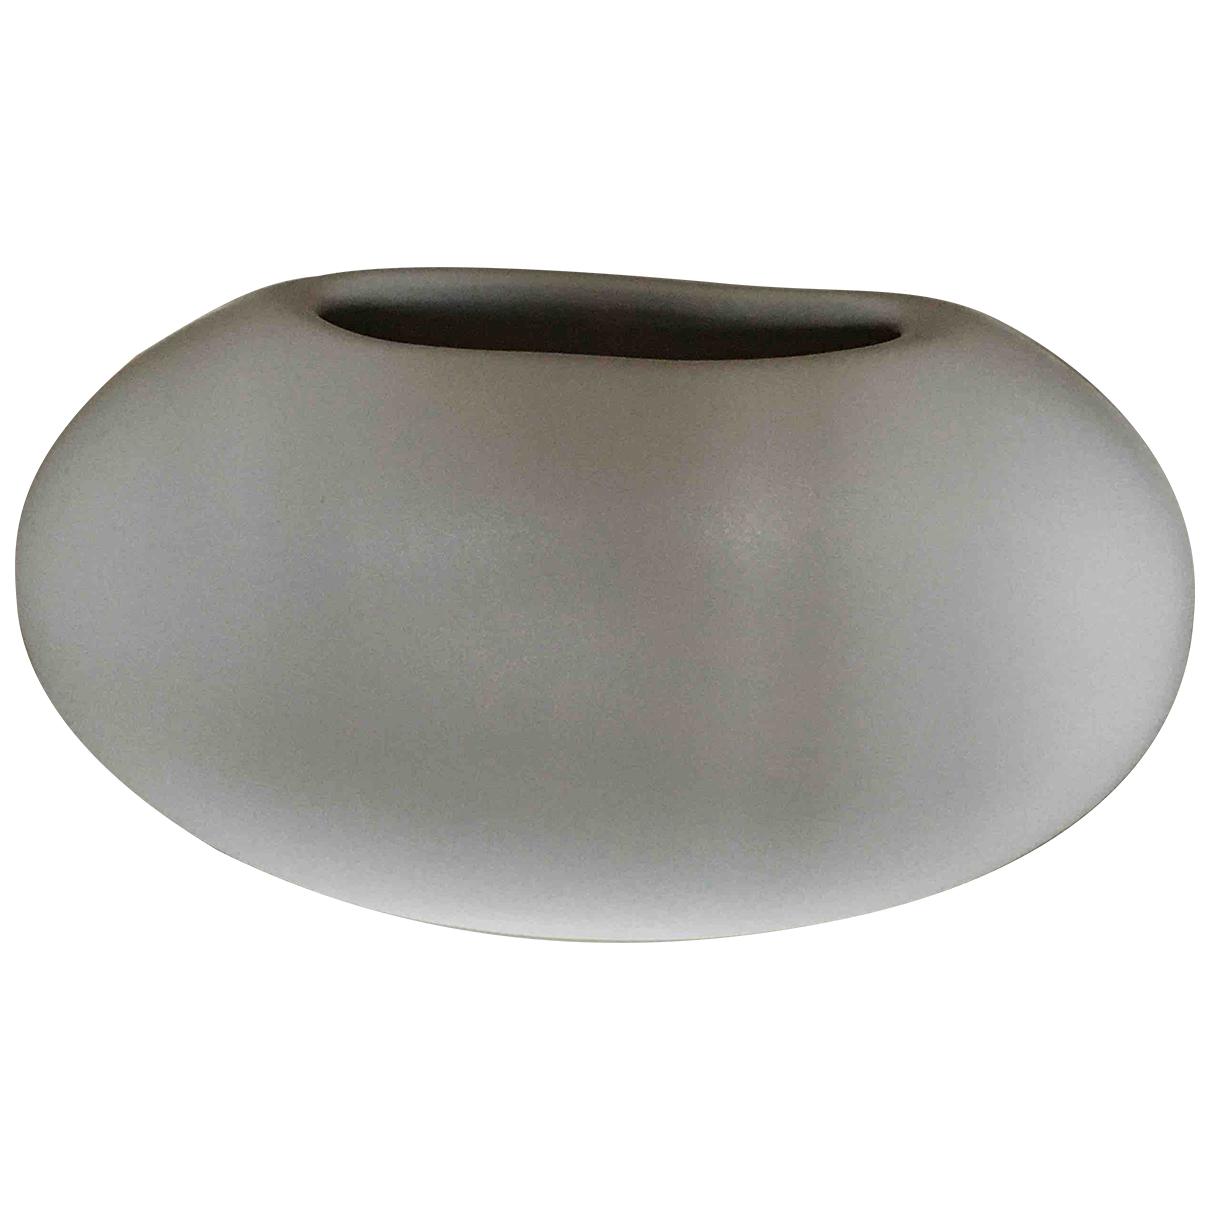 Jarron de Ceramica Non Signe / Unsigned